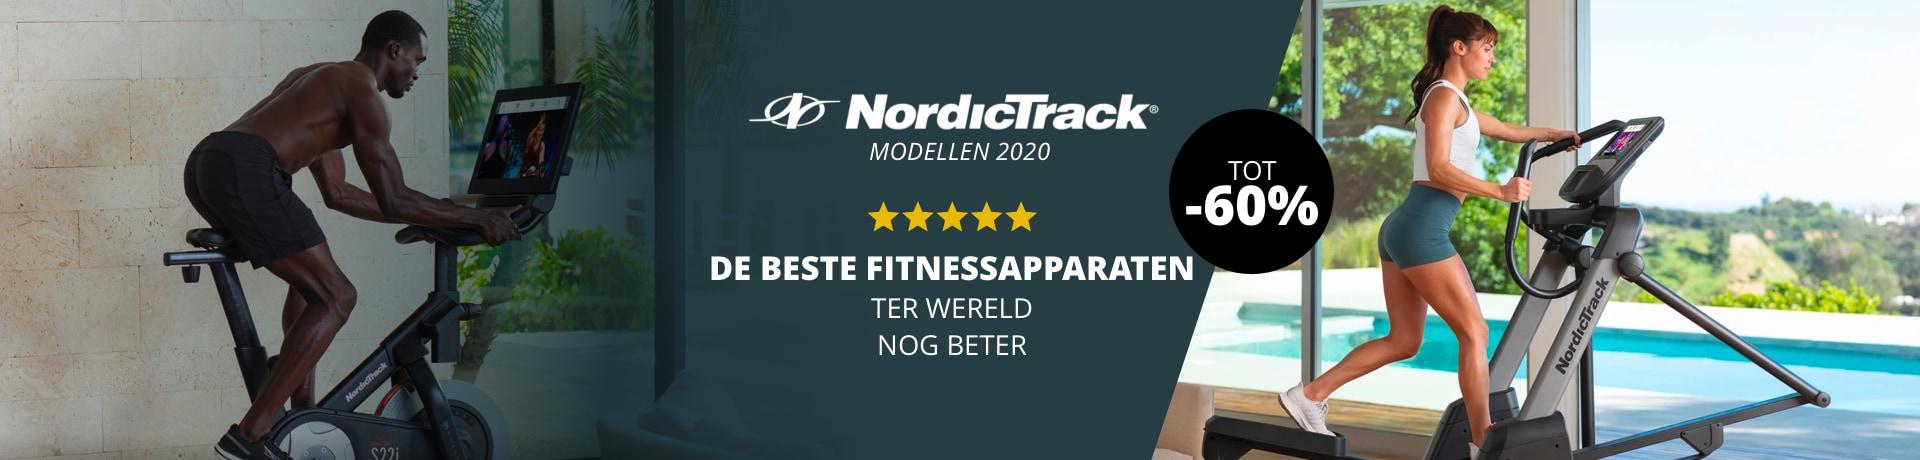 sale-nordictrack